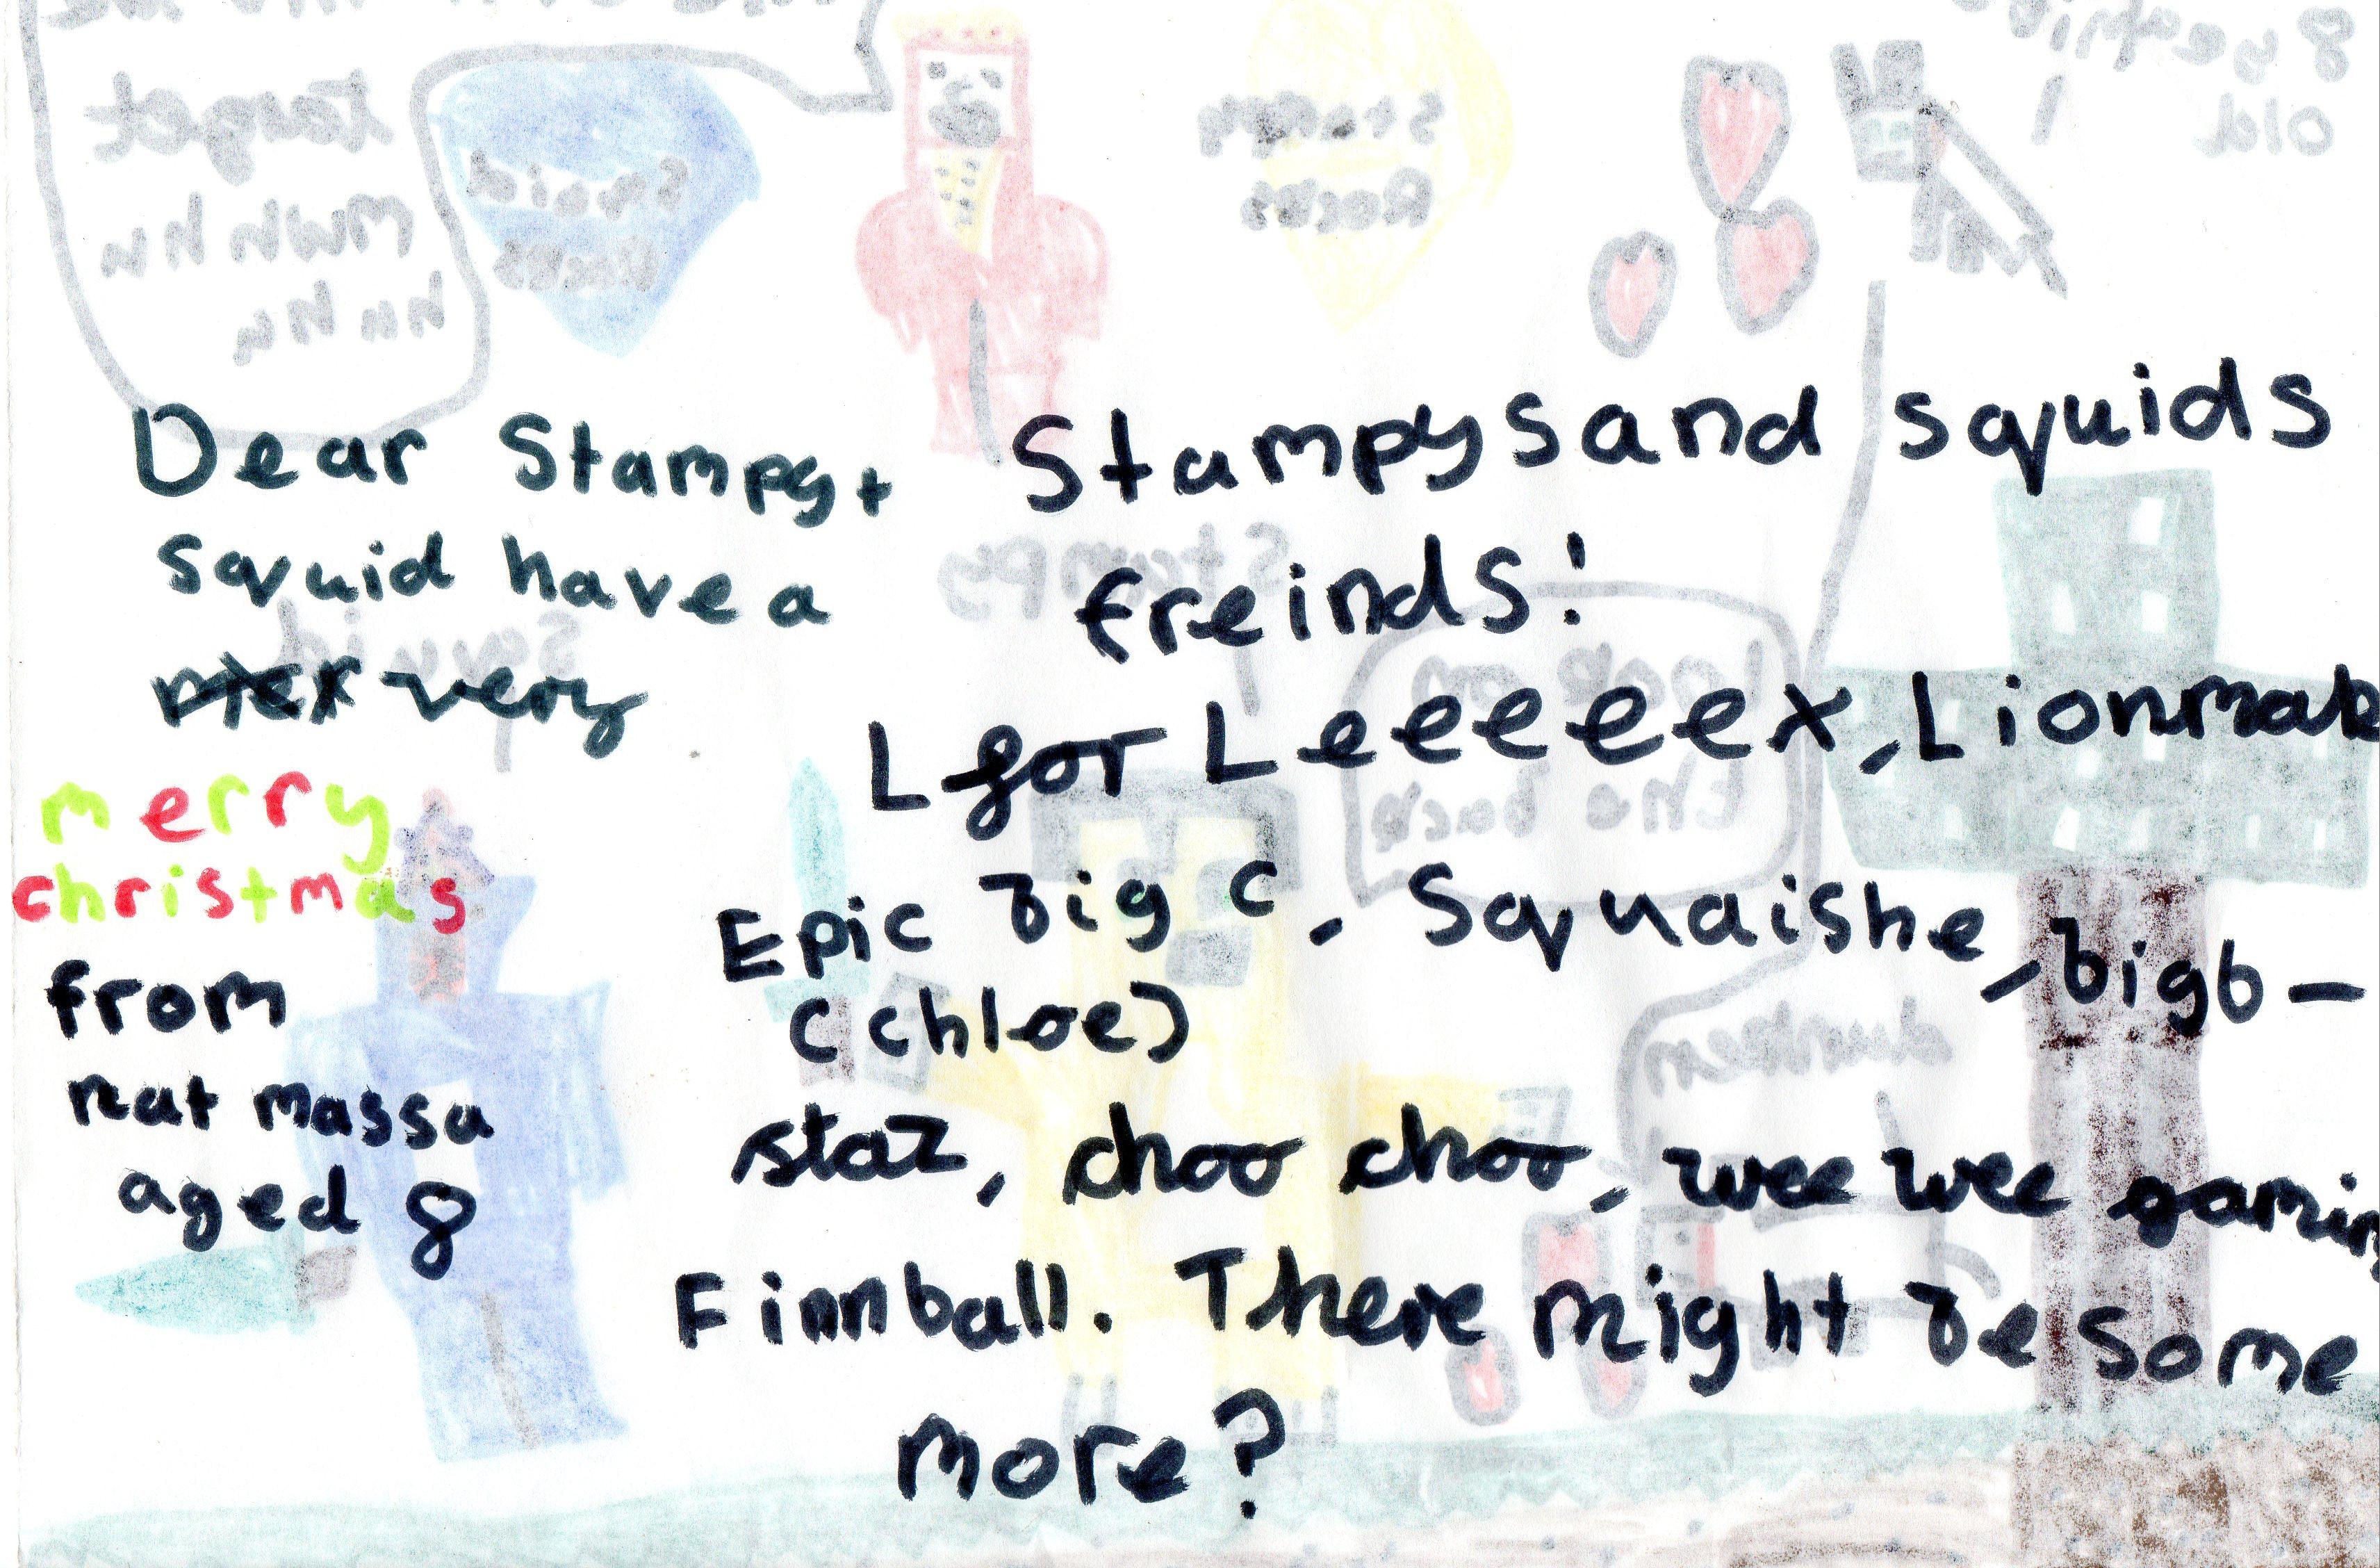 Nat Massa's message to Stampy and Squid